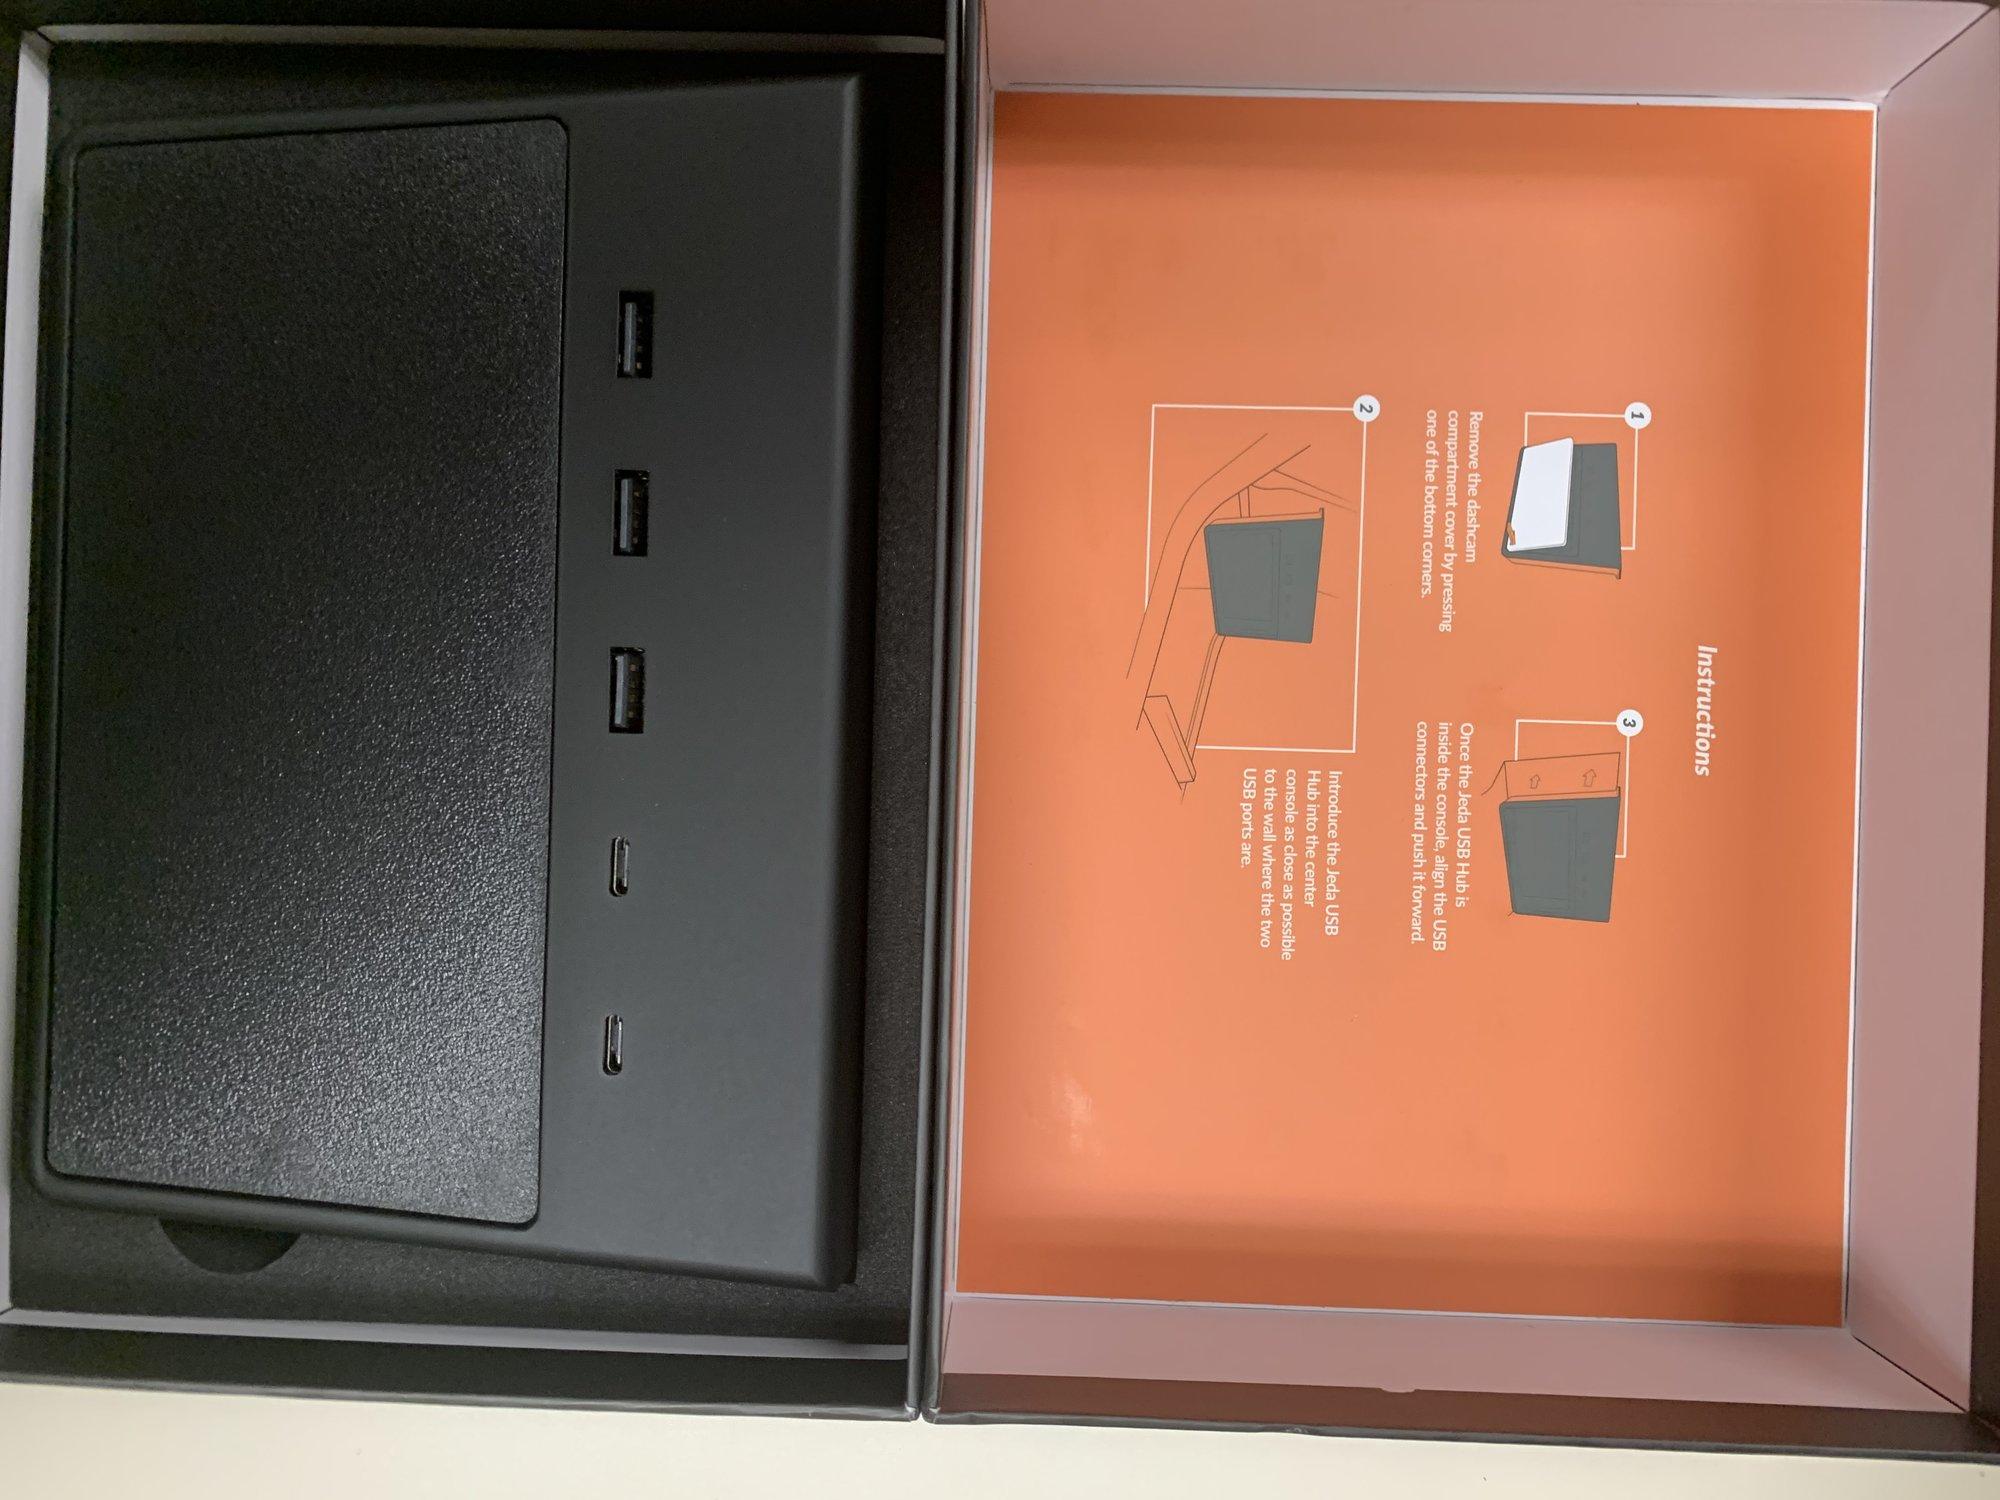 Jeda USB Hub Replacement.jpg